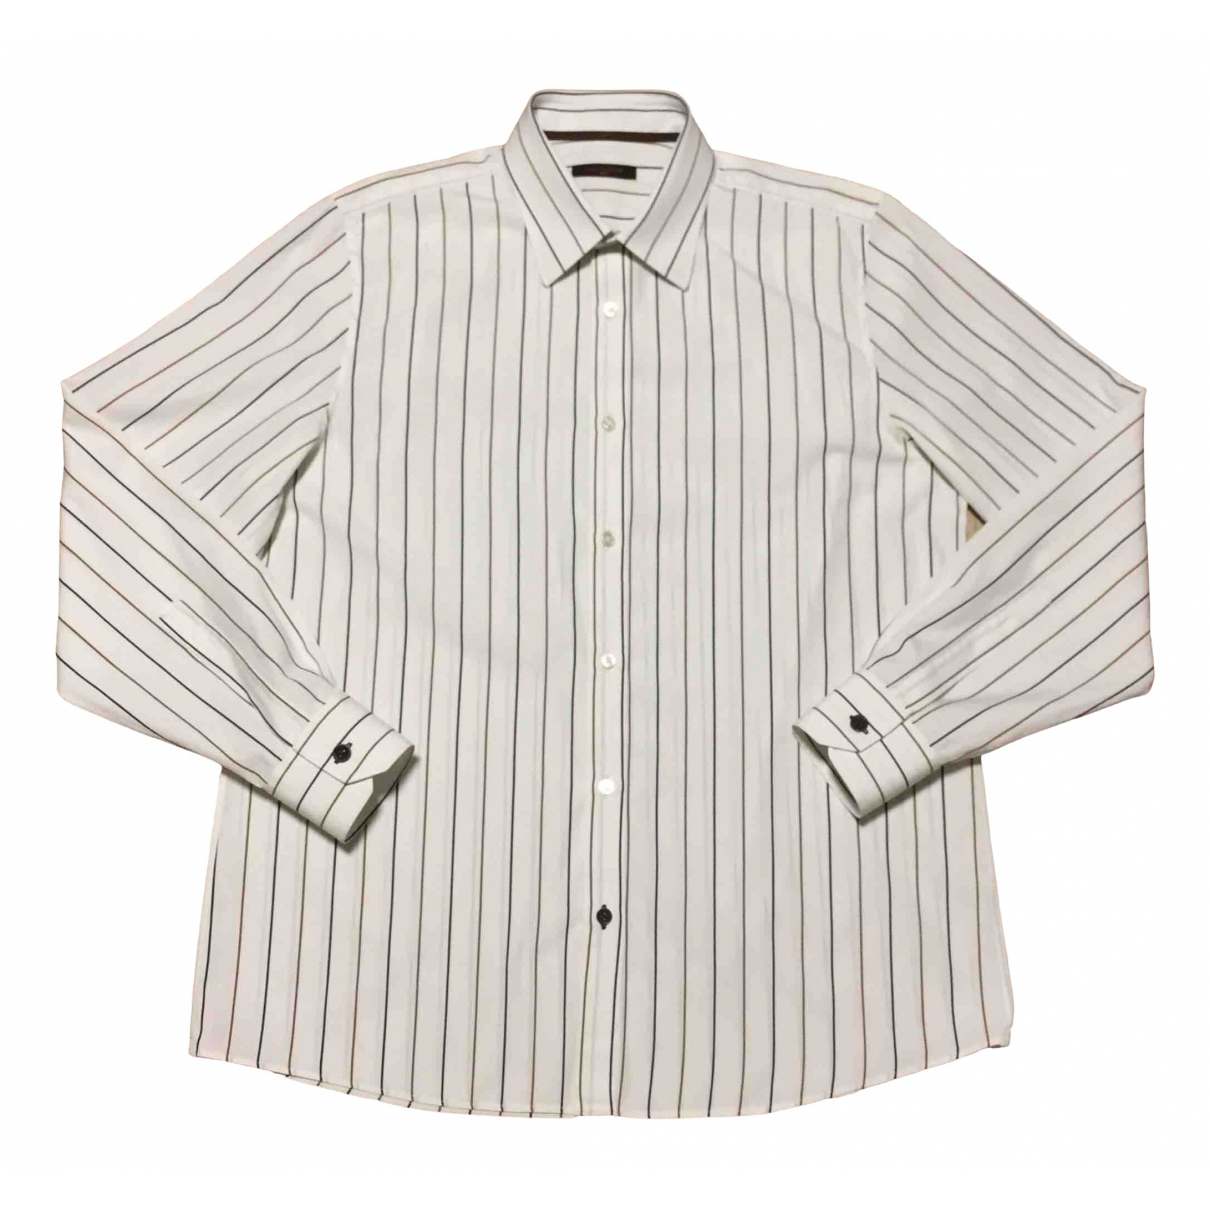 Louis Vuitton \N White Cotton Shirts for Men L International